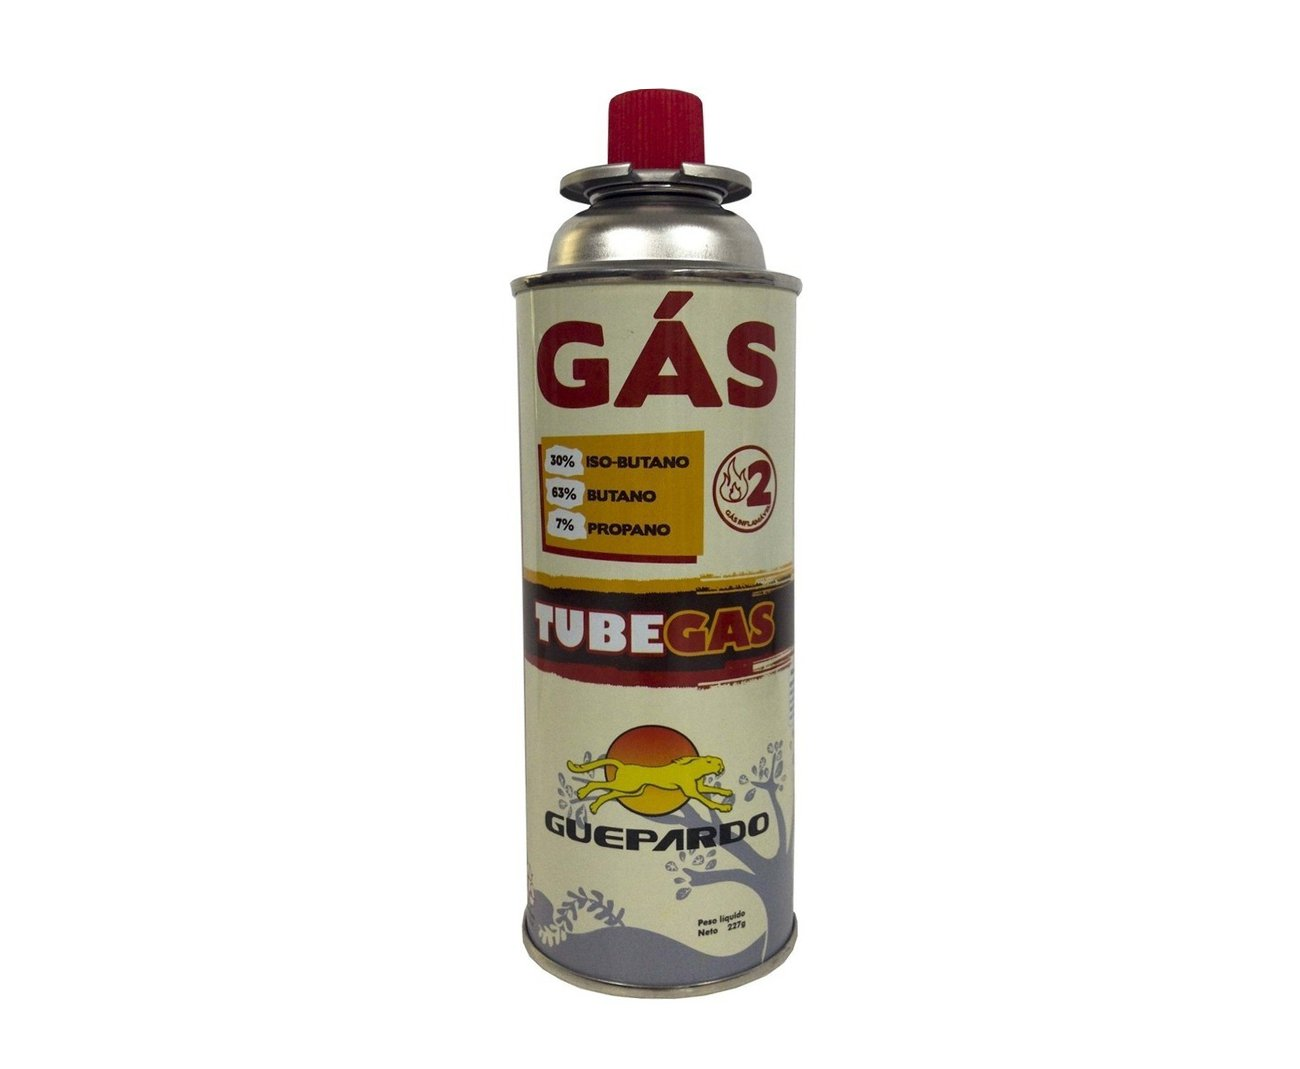 Refil Tube Gás 227 Gr - Guepardo